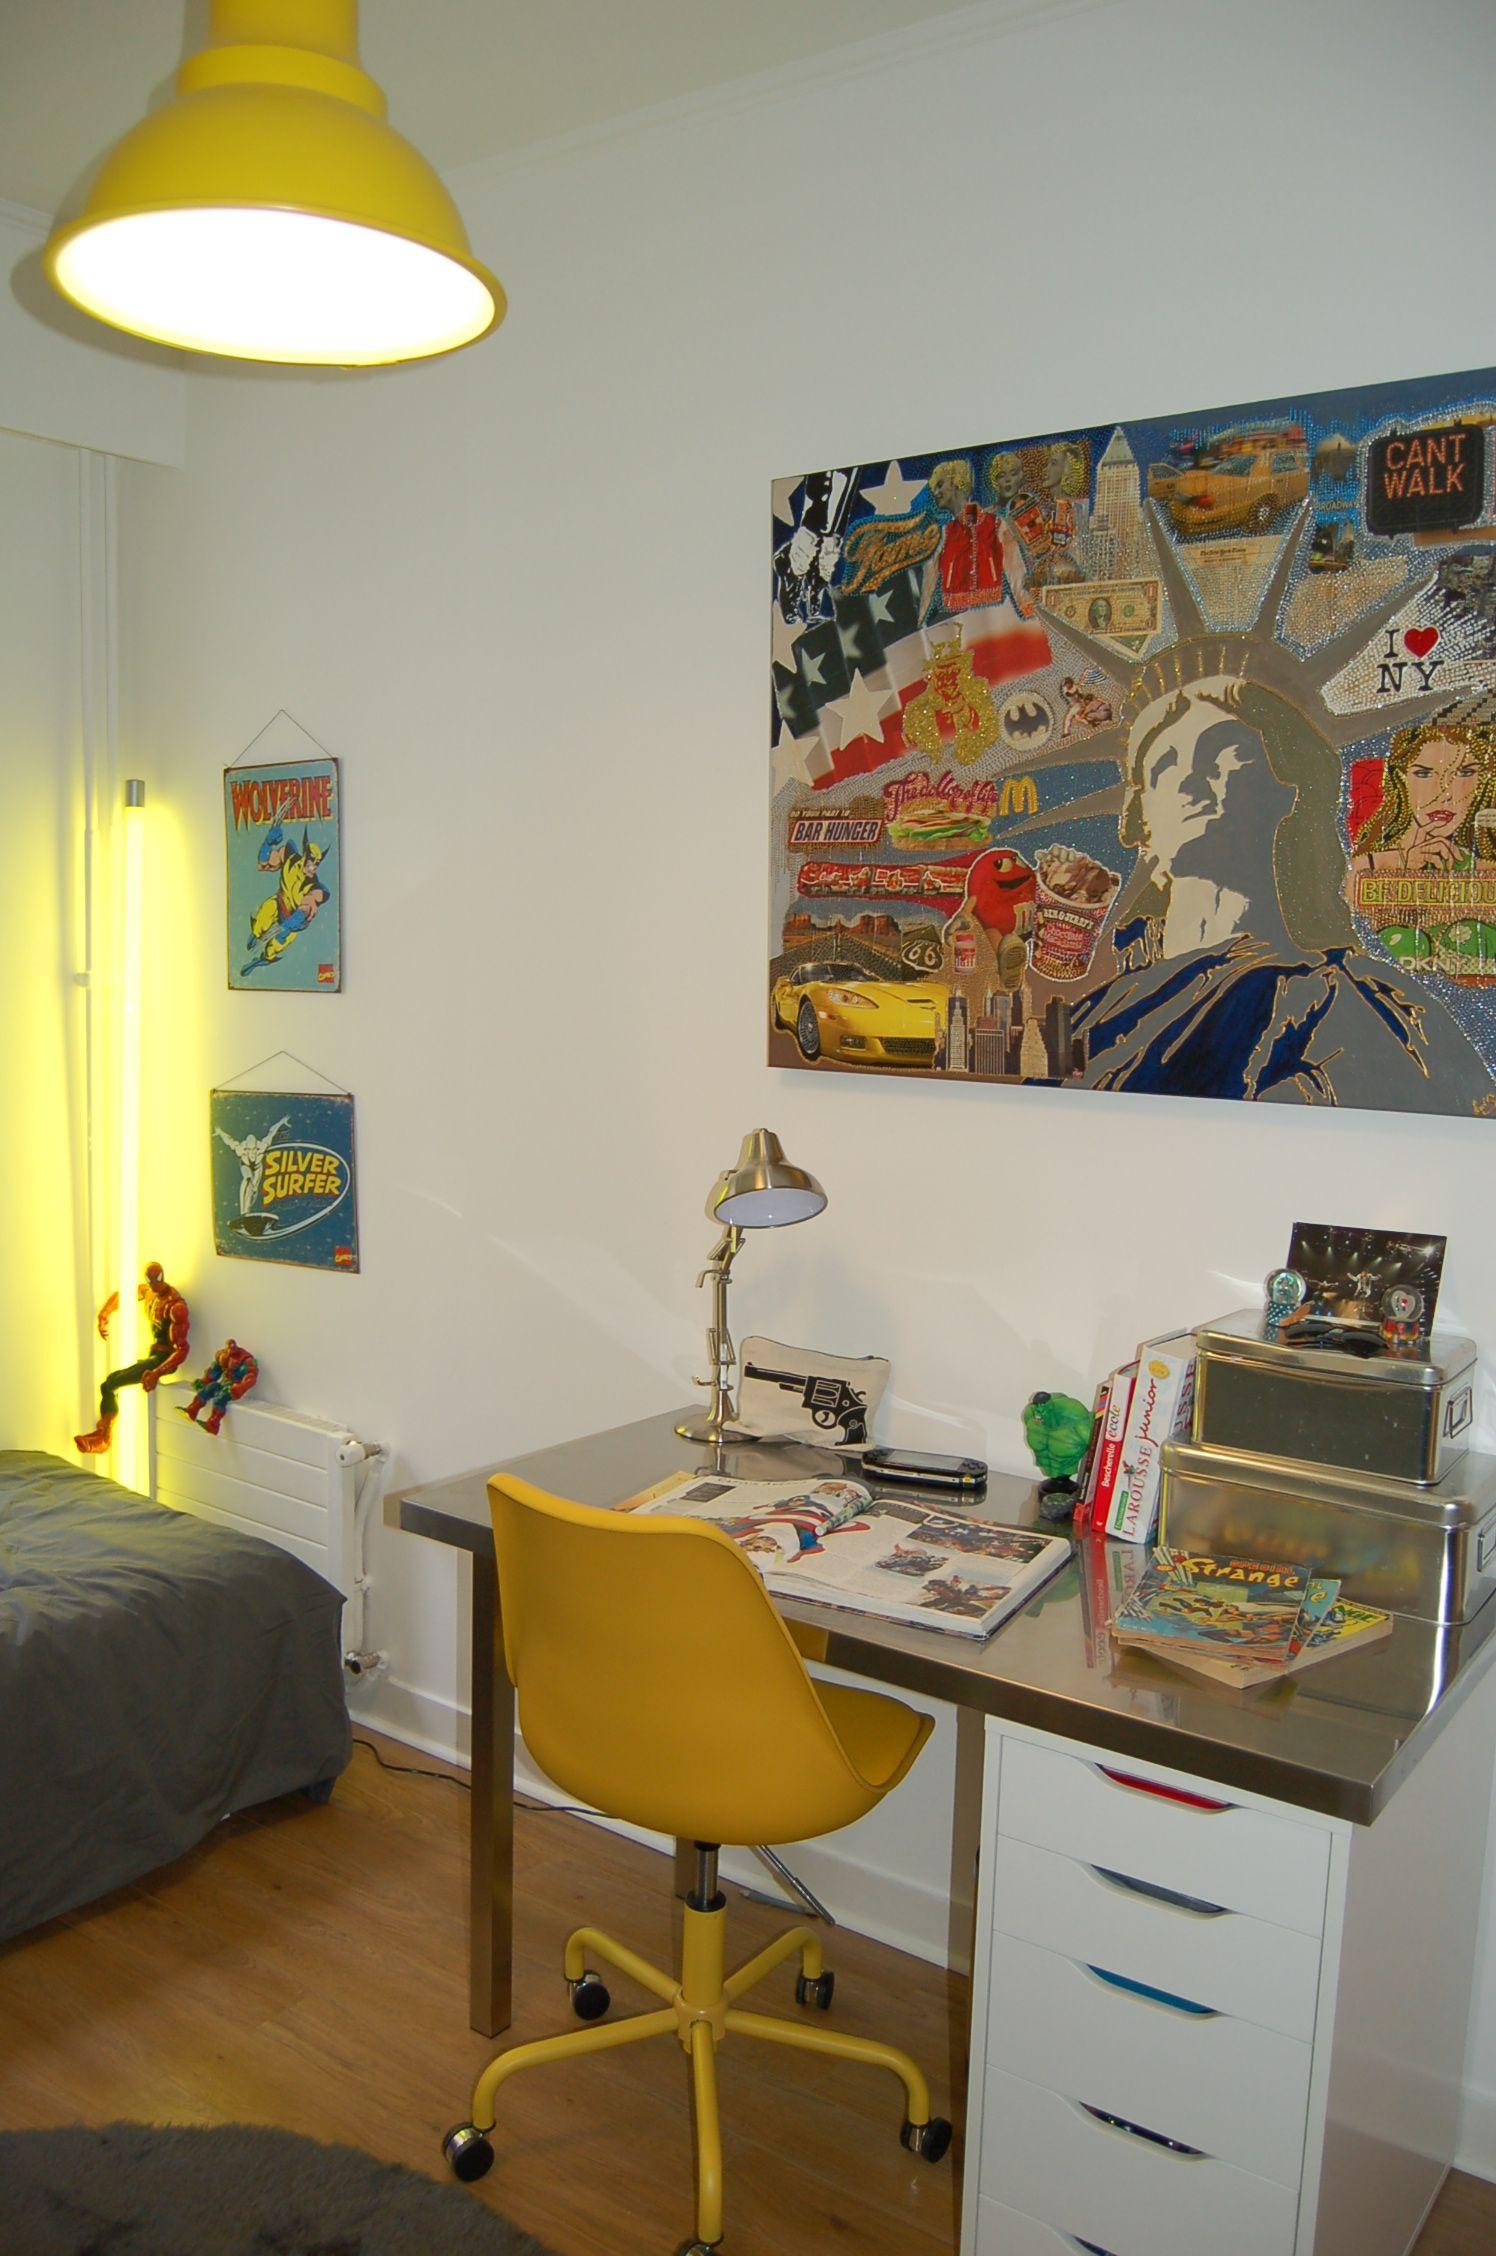 chambre grise et jaune tableau newyork chambre gar231on